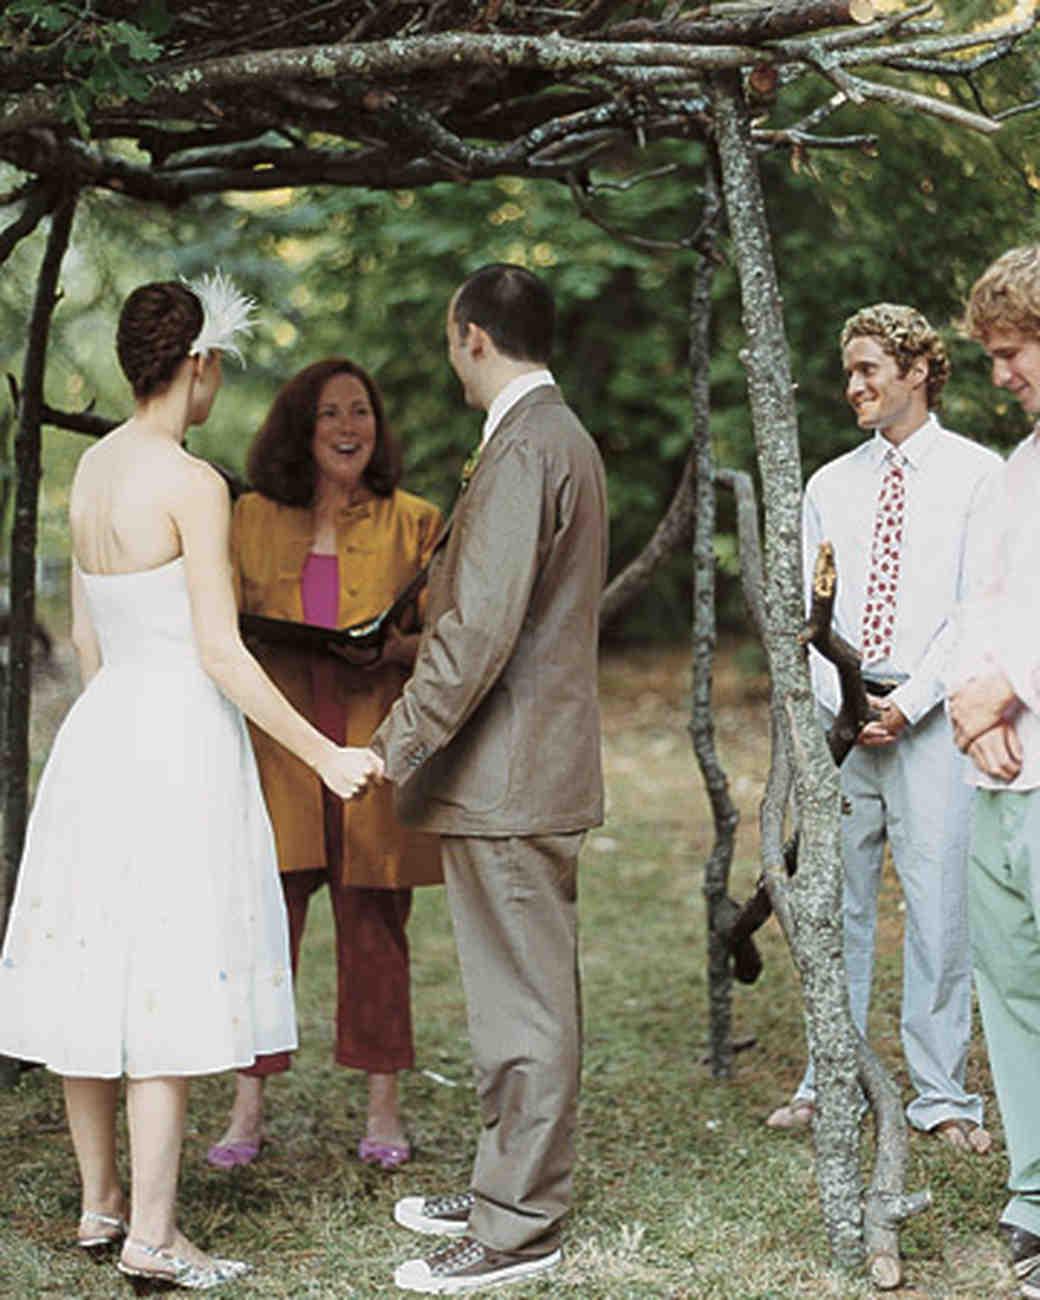 Awesome Wedding Arch Ideas Outdoor Weddings Images Styles With Outdoor  Wedding Arch Ideas